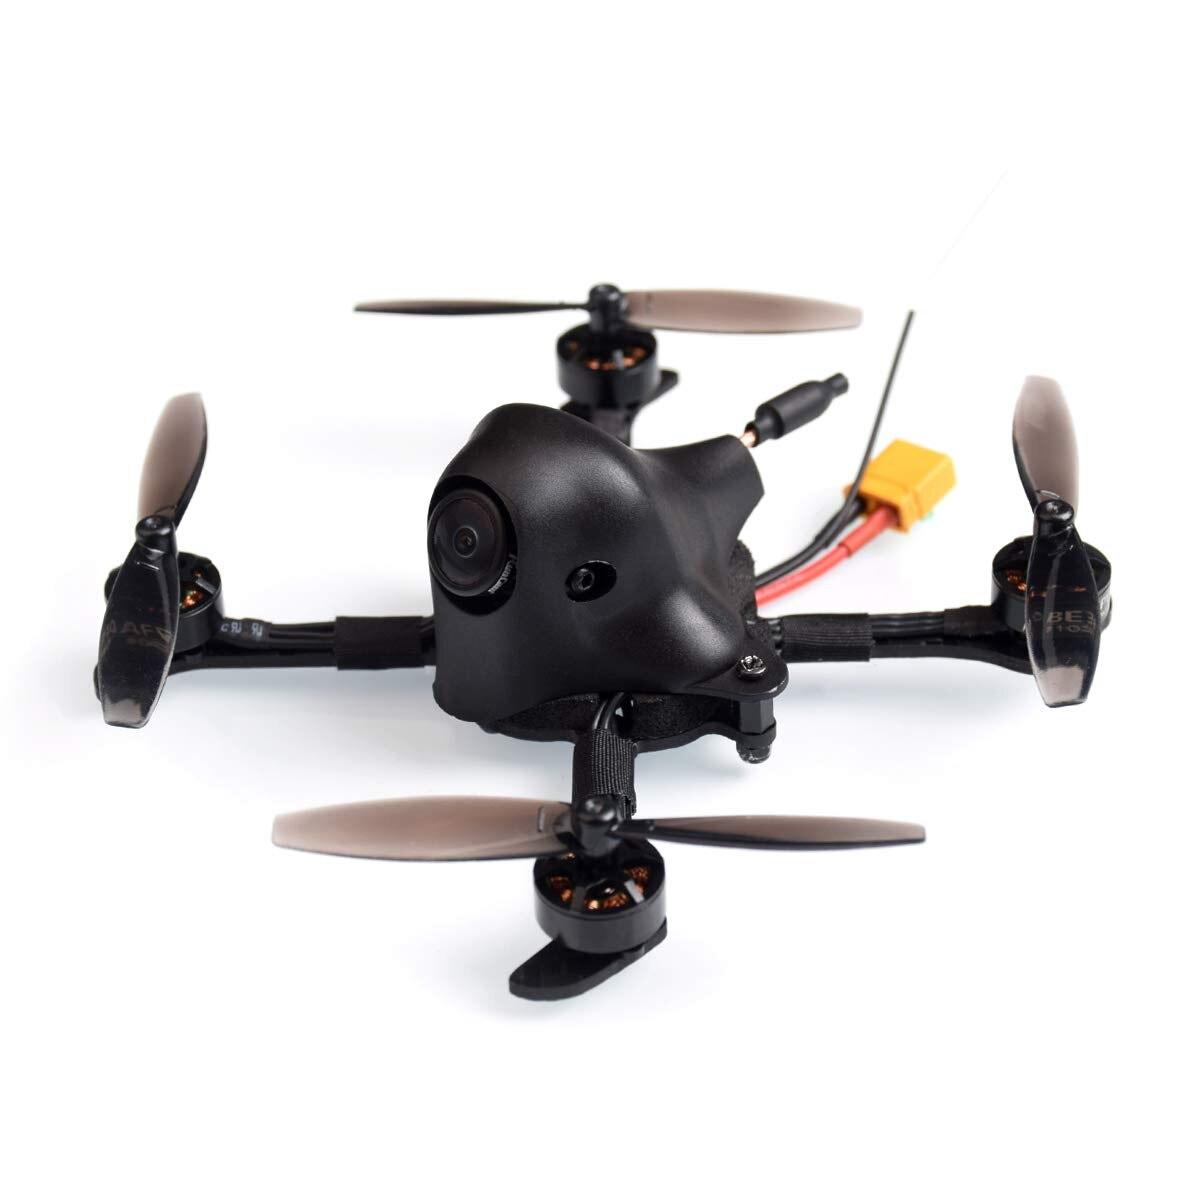 Hx100 100mm 2 3 s fpv 레이싱 quadcopter 탄소 섬유 f4 2 4 s aio 12a fc runcam nano v2 카메라 osd 스마트 오디오 모터 rc 무인 항공기-에서부품 & 액세서리부터 완구 & 취미 의  그룹 1